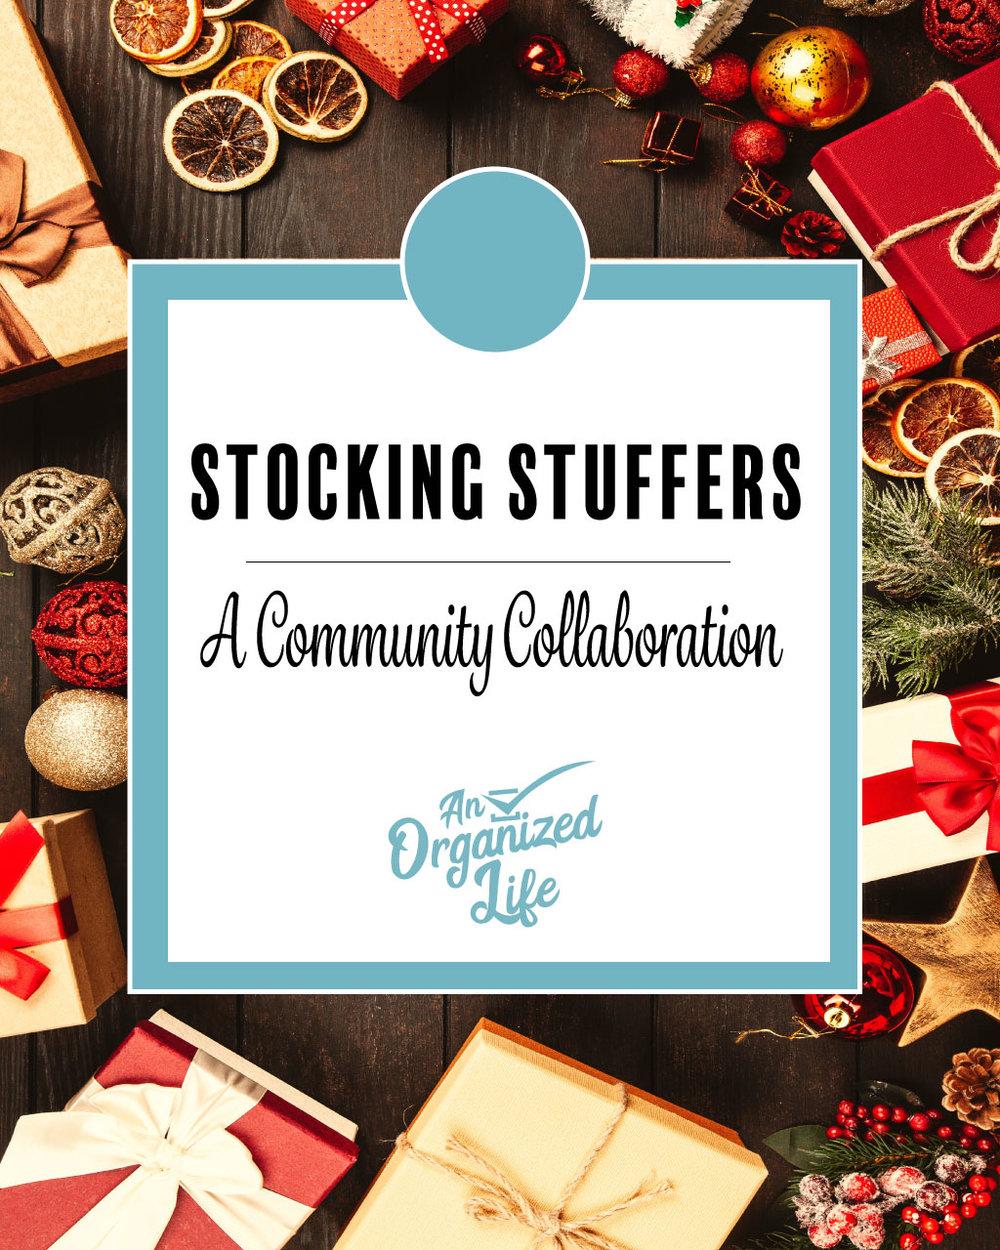 An Organized Life: Christmas